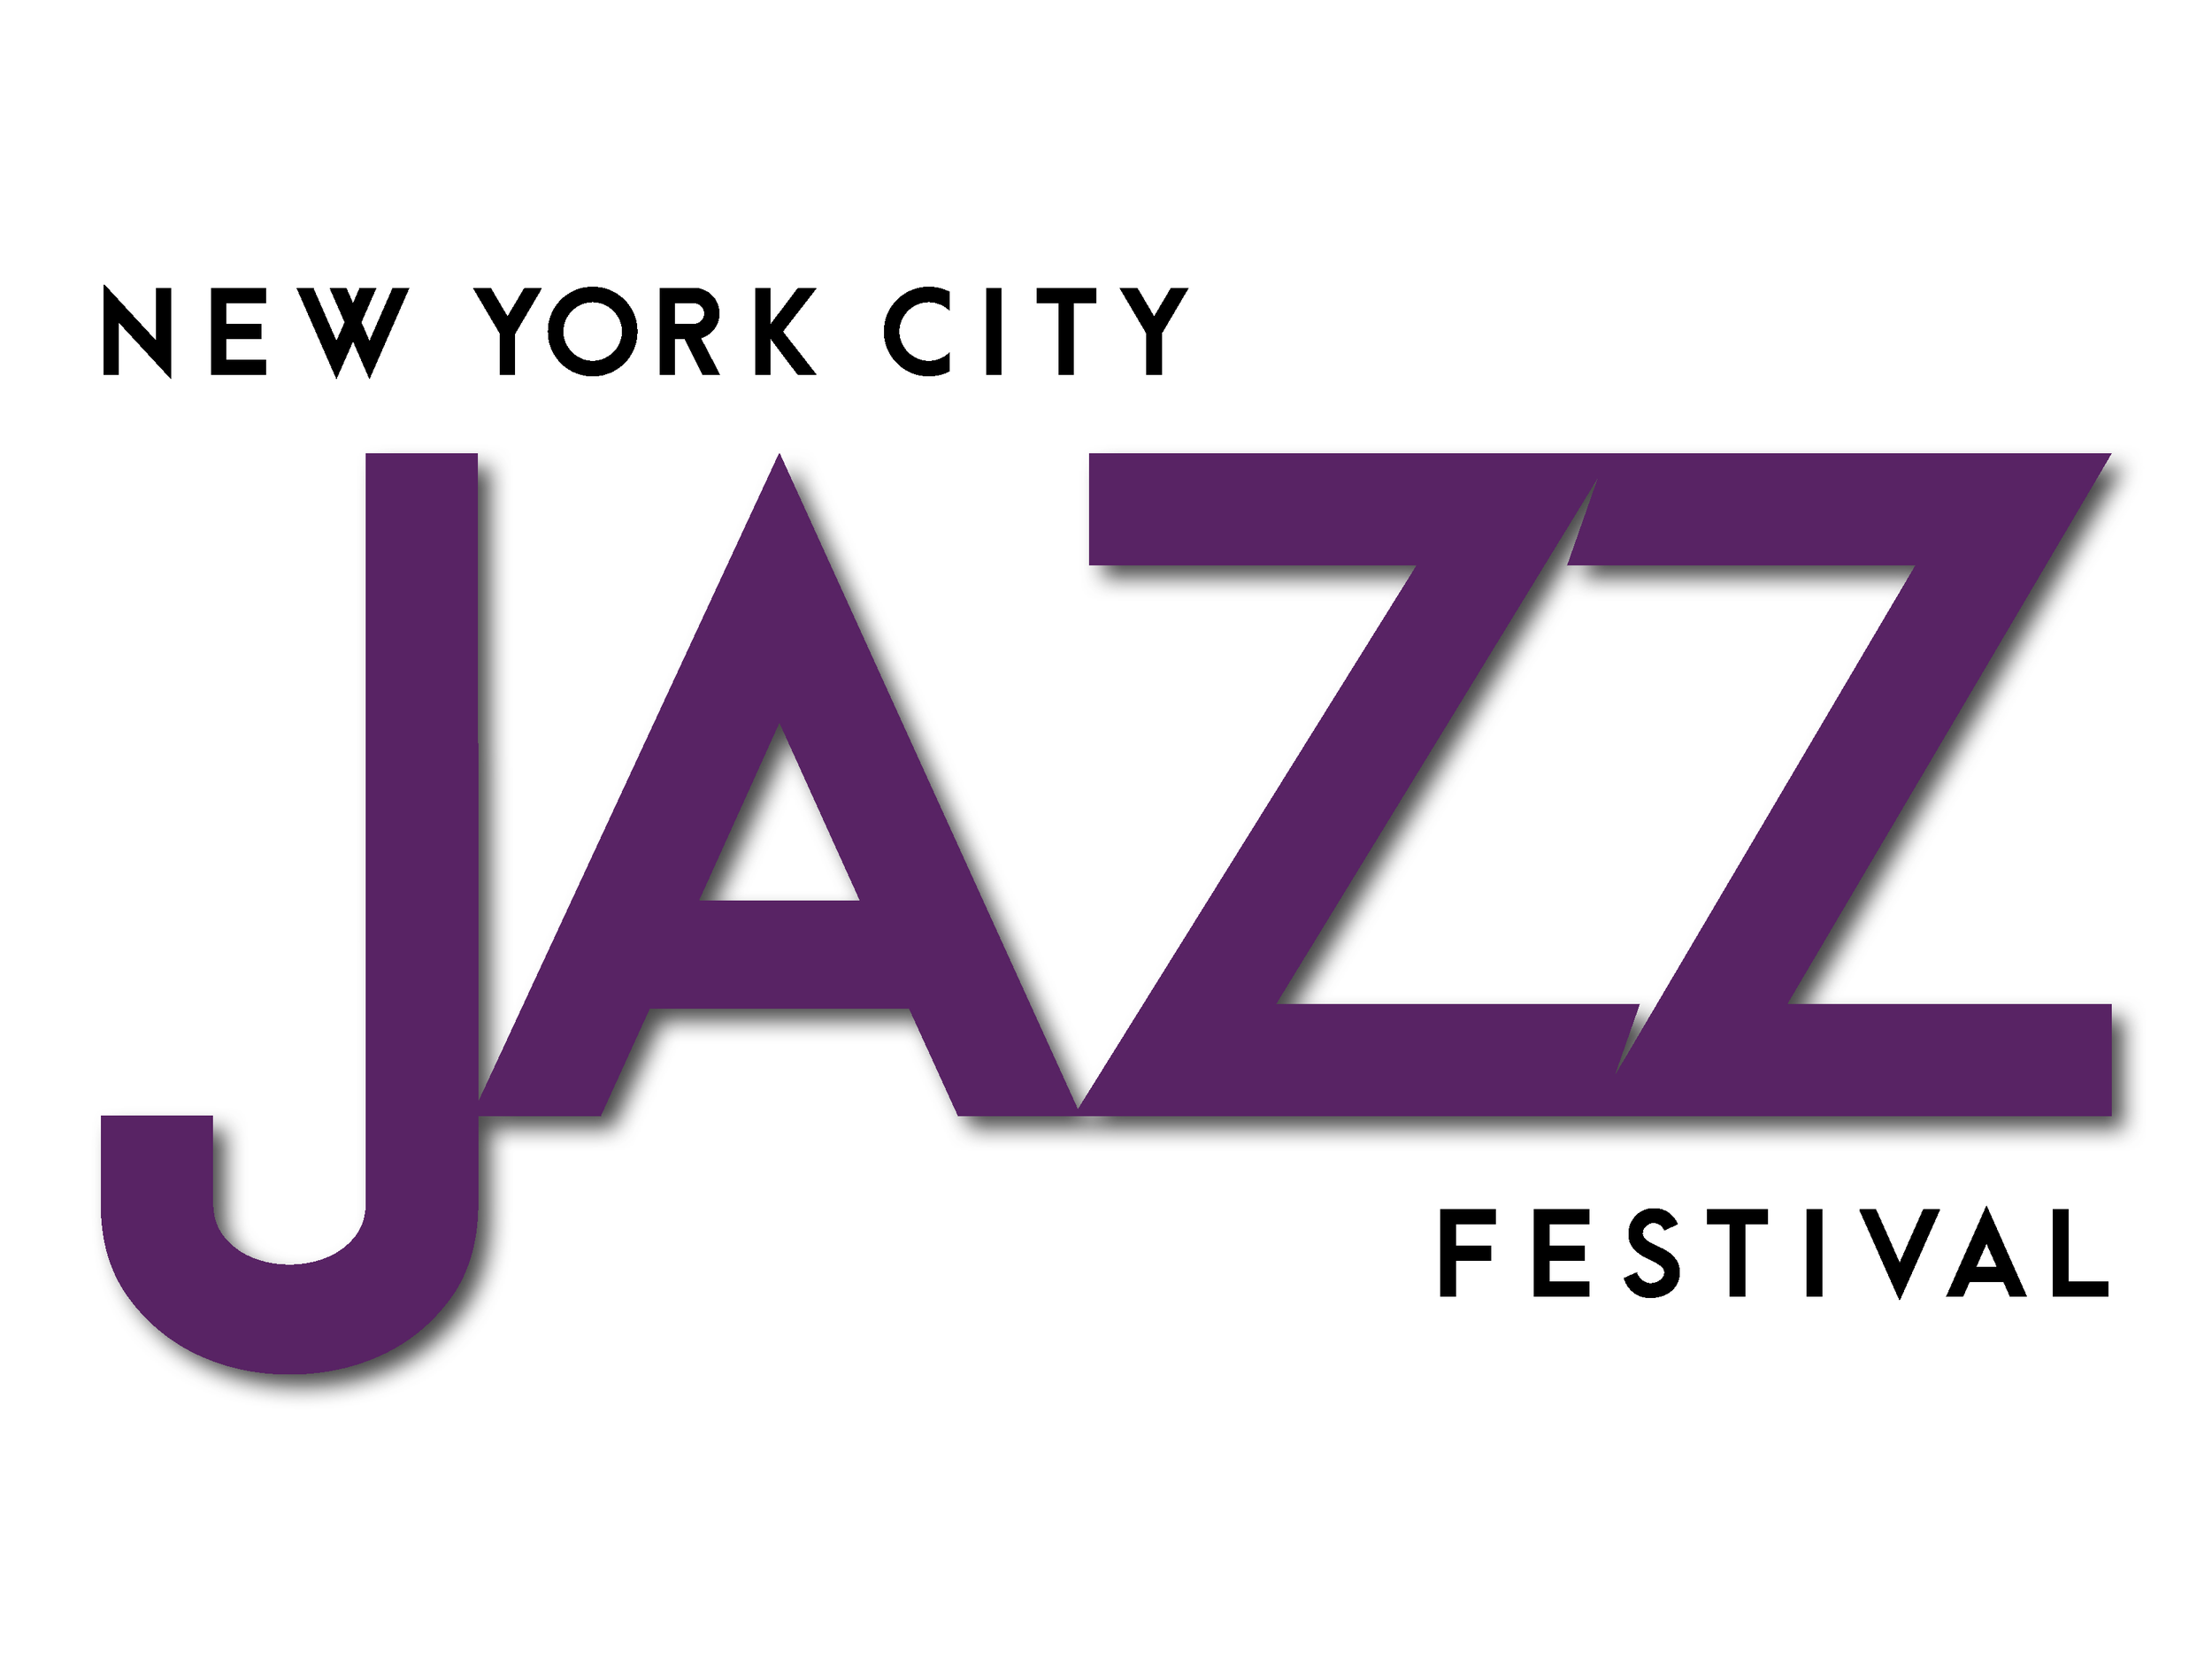 Performances mcp daytimejazz logo 2018g the mcp new york stopboris Image collections